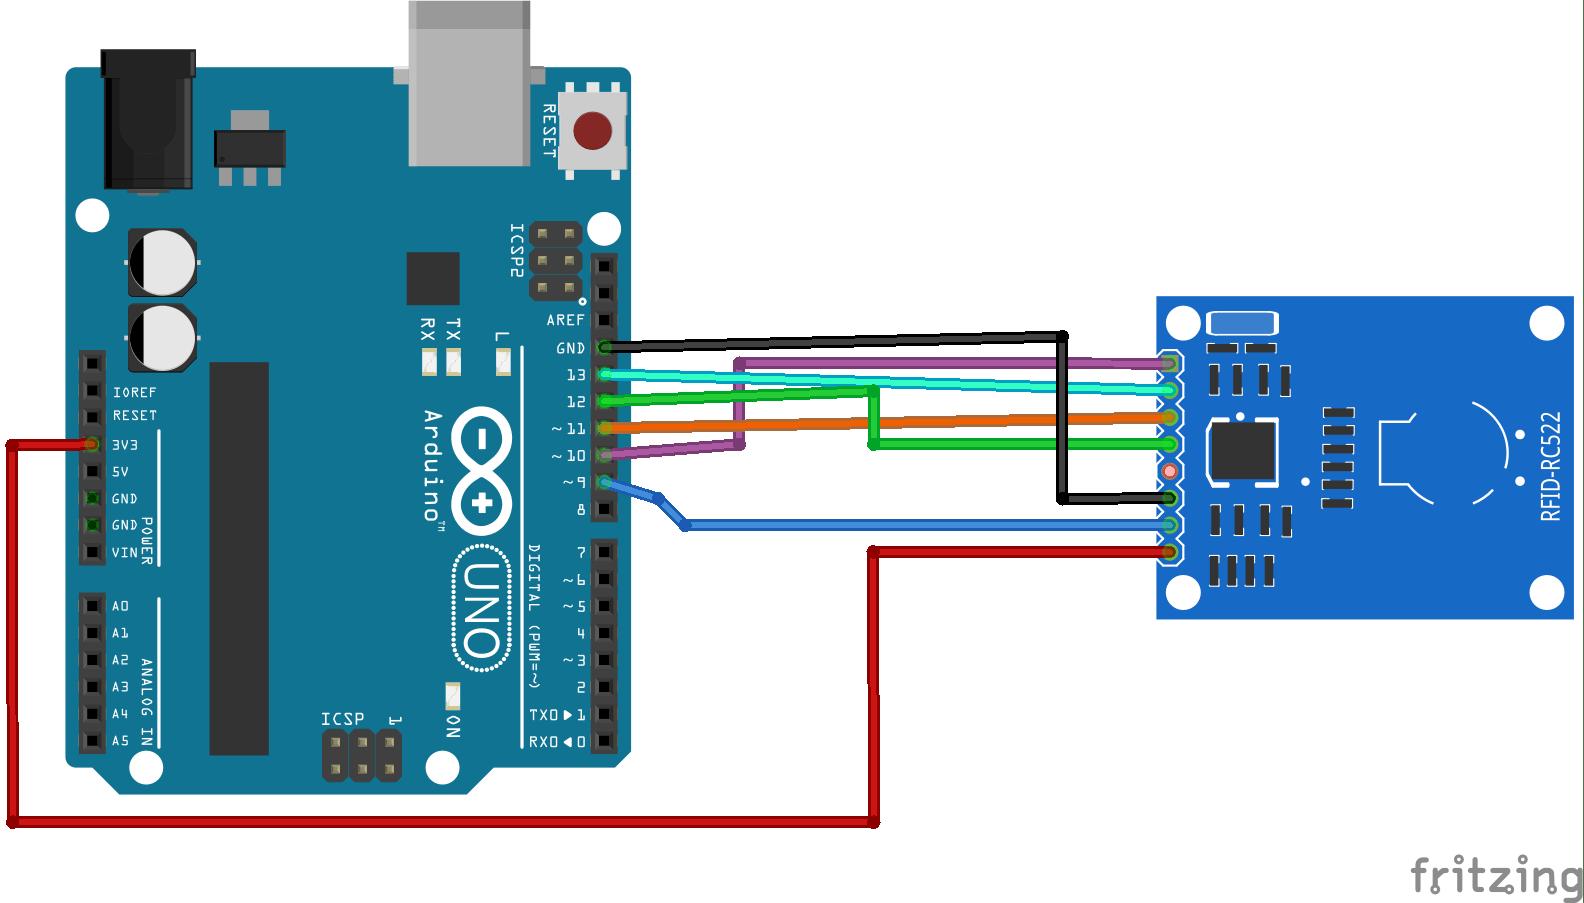 Rfid Tags Supermarket Diagram - Circuit Connection Diagram •